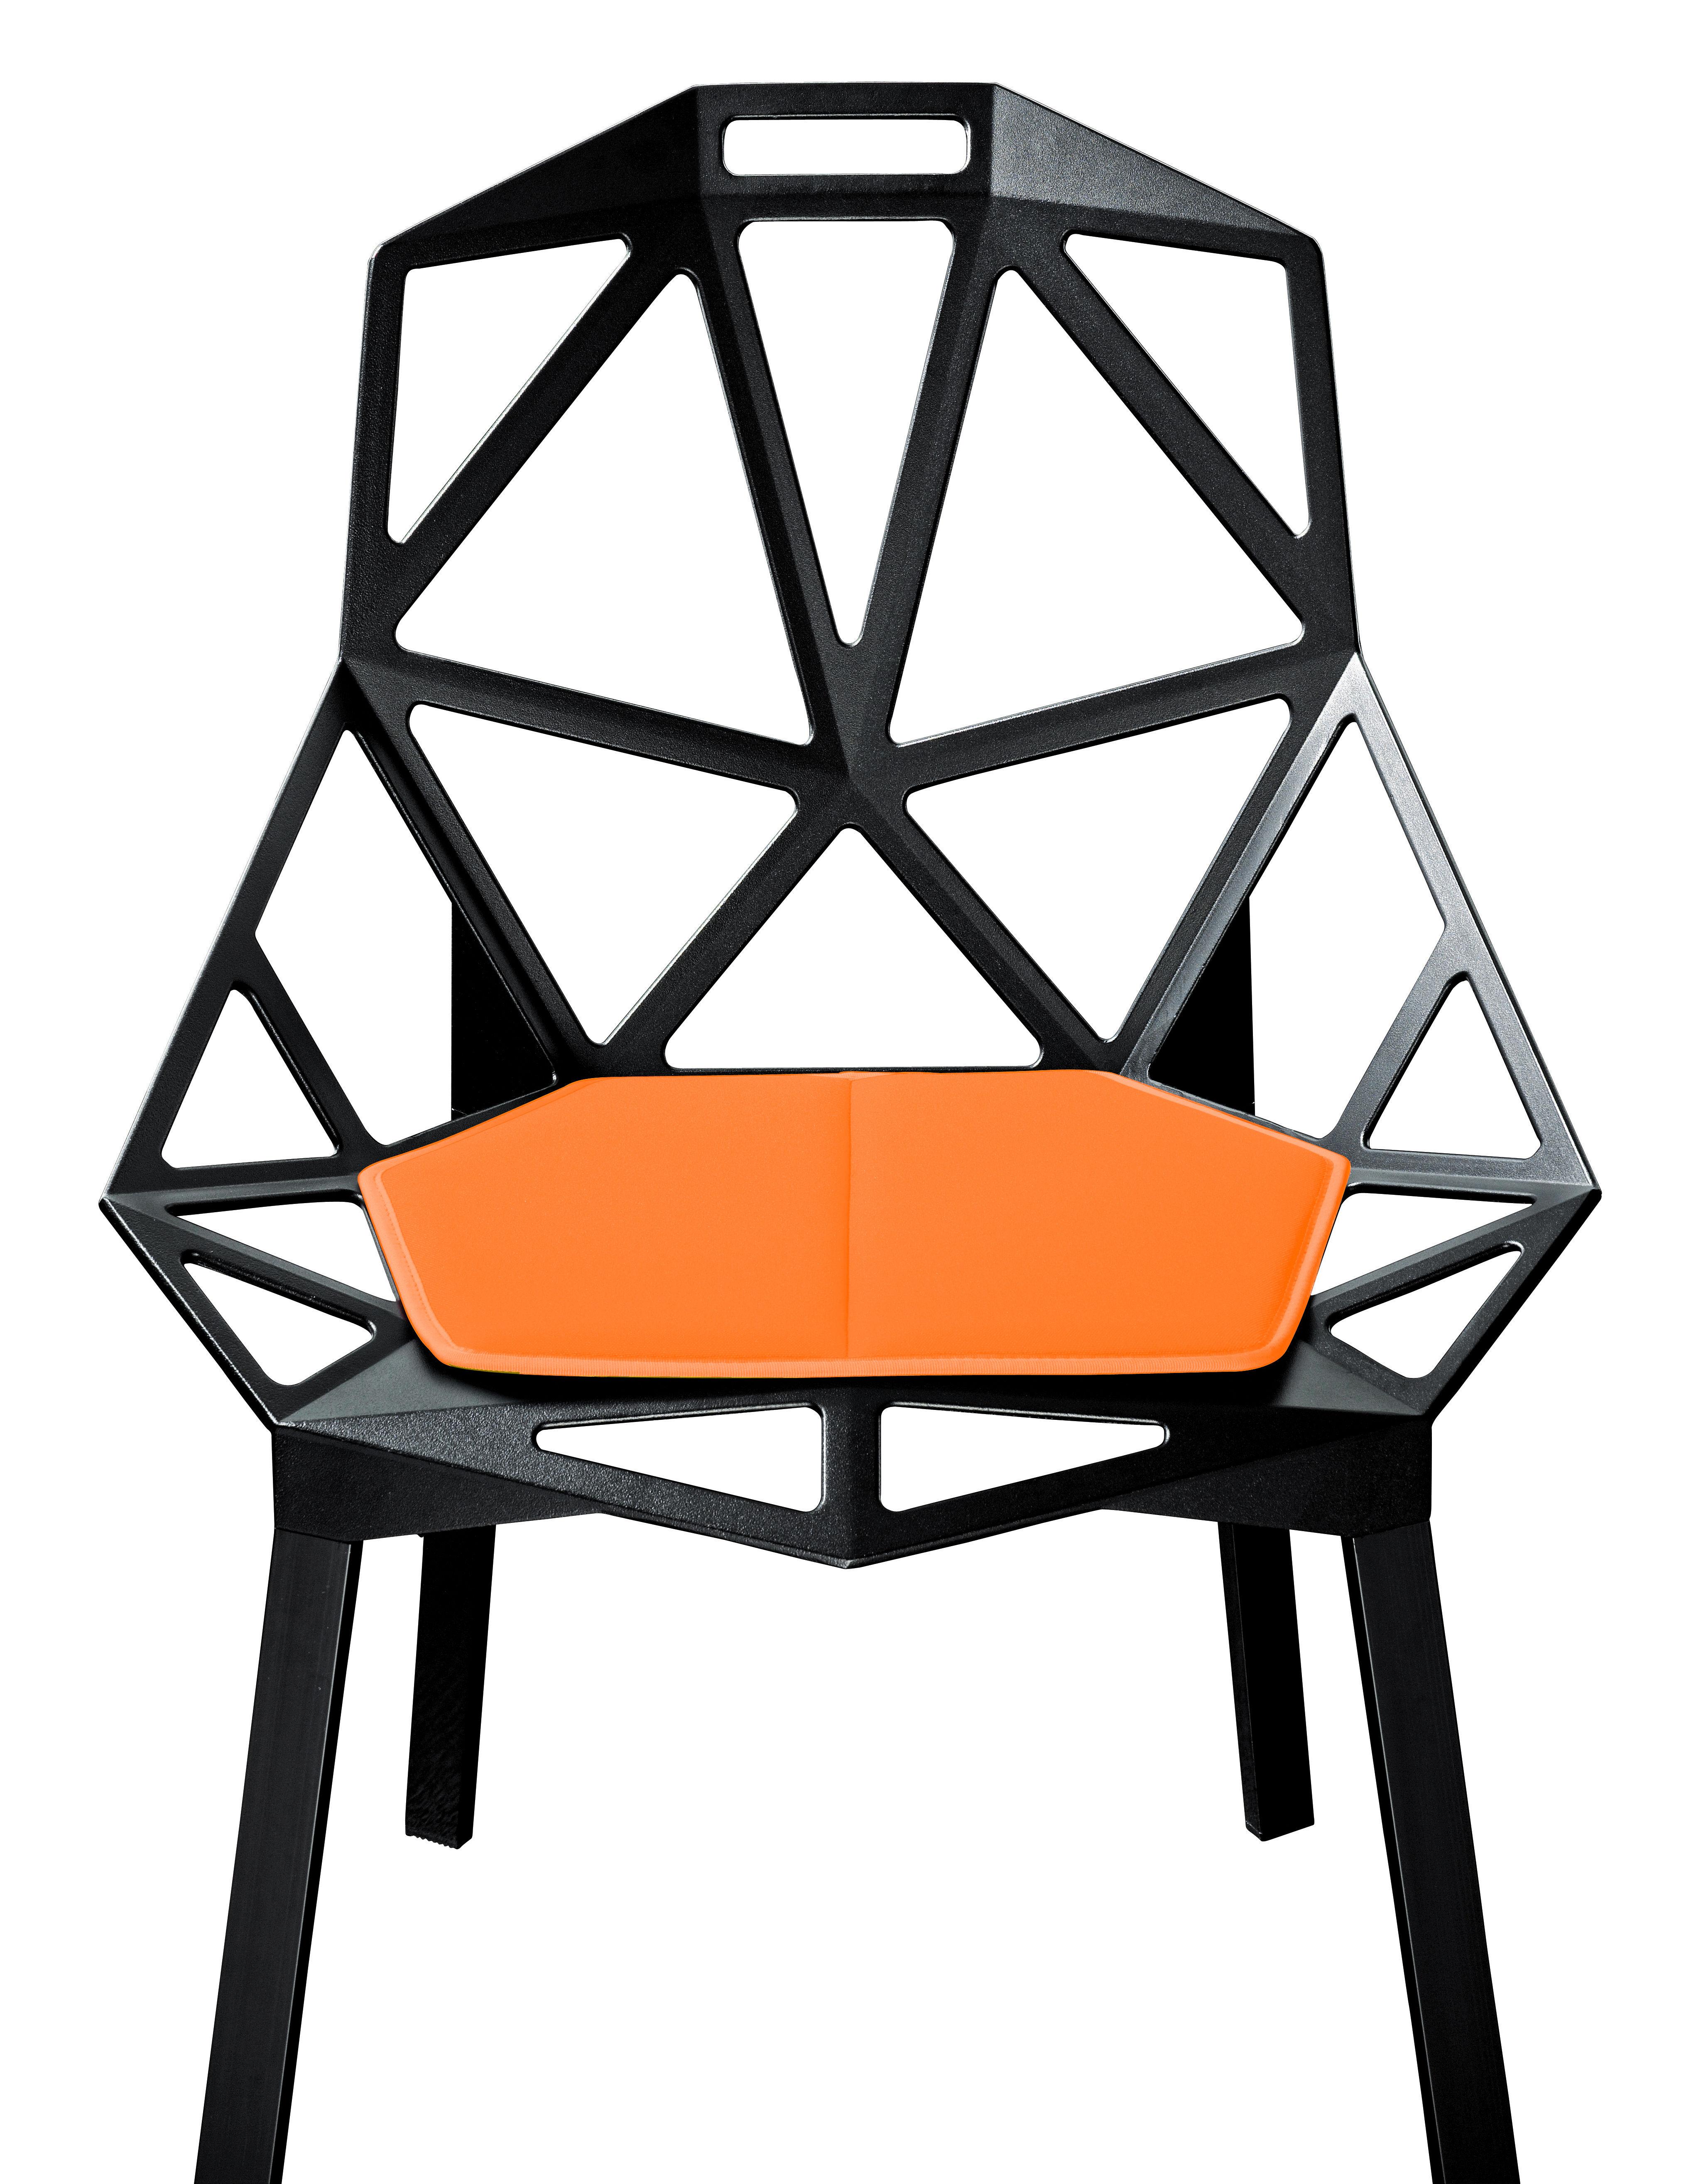 Decoration - Cushions & Poufs - Seat cushion by Magis - Orange - Polyurethane